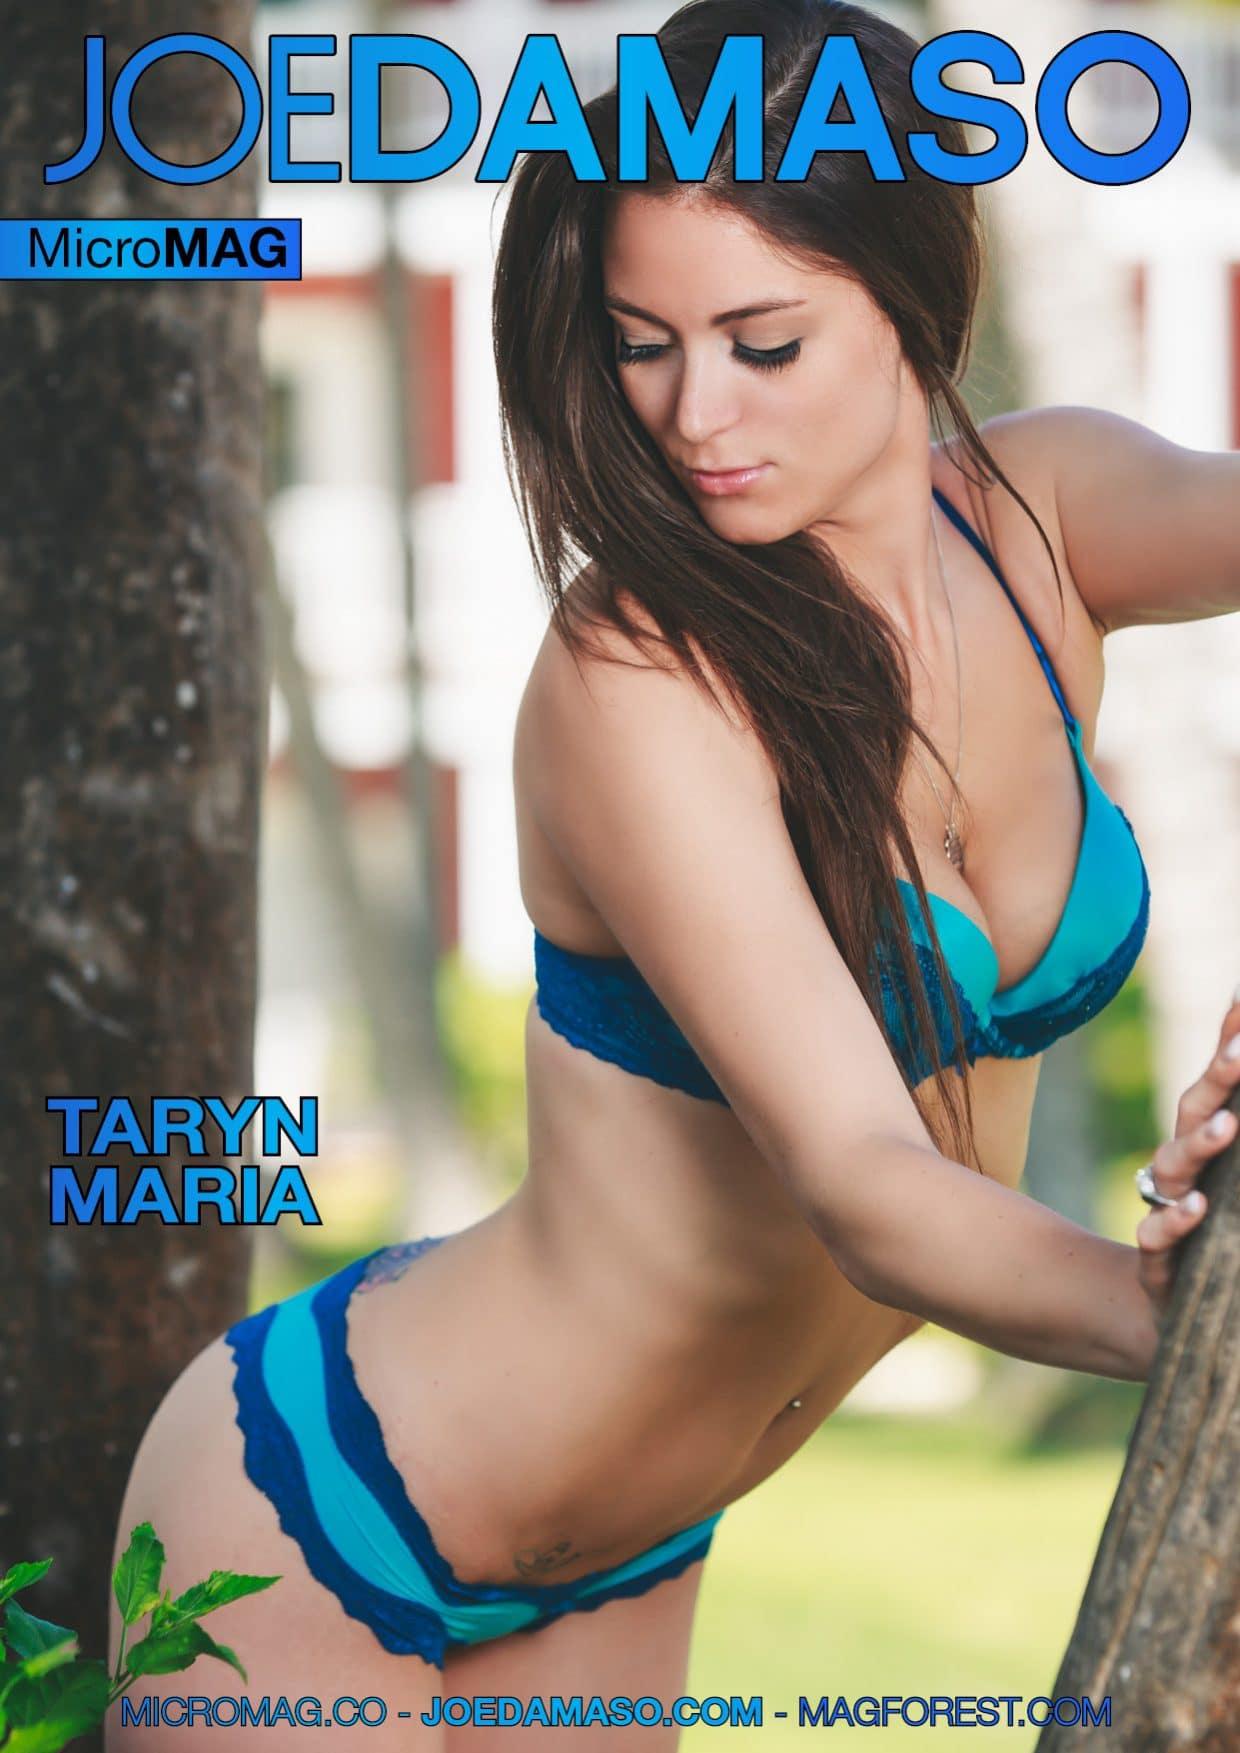 Joe Damaso MicroMag - Taryn Maria 1